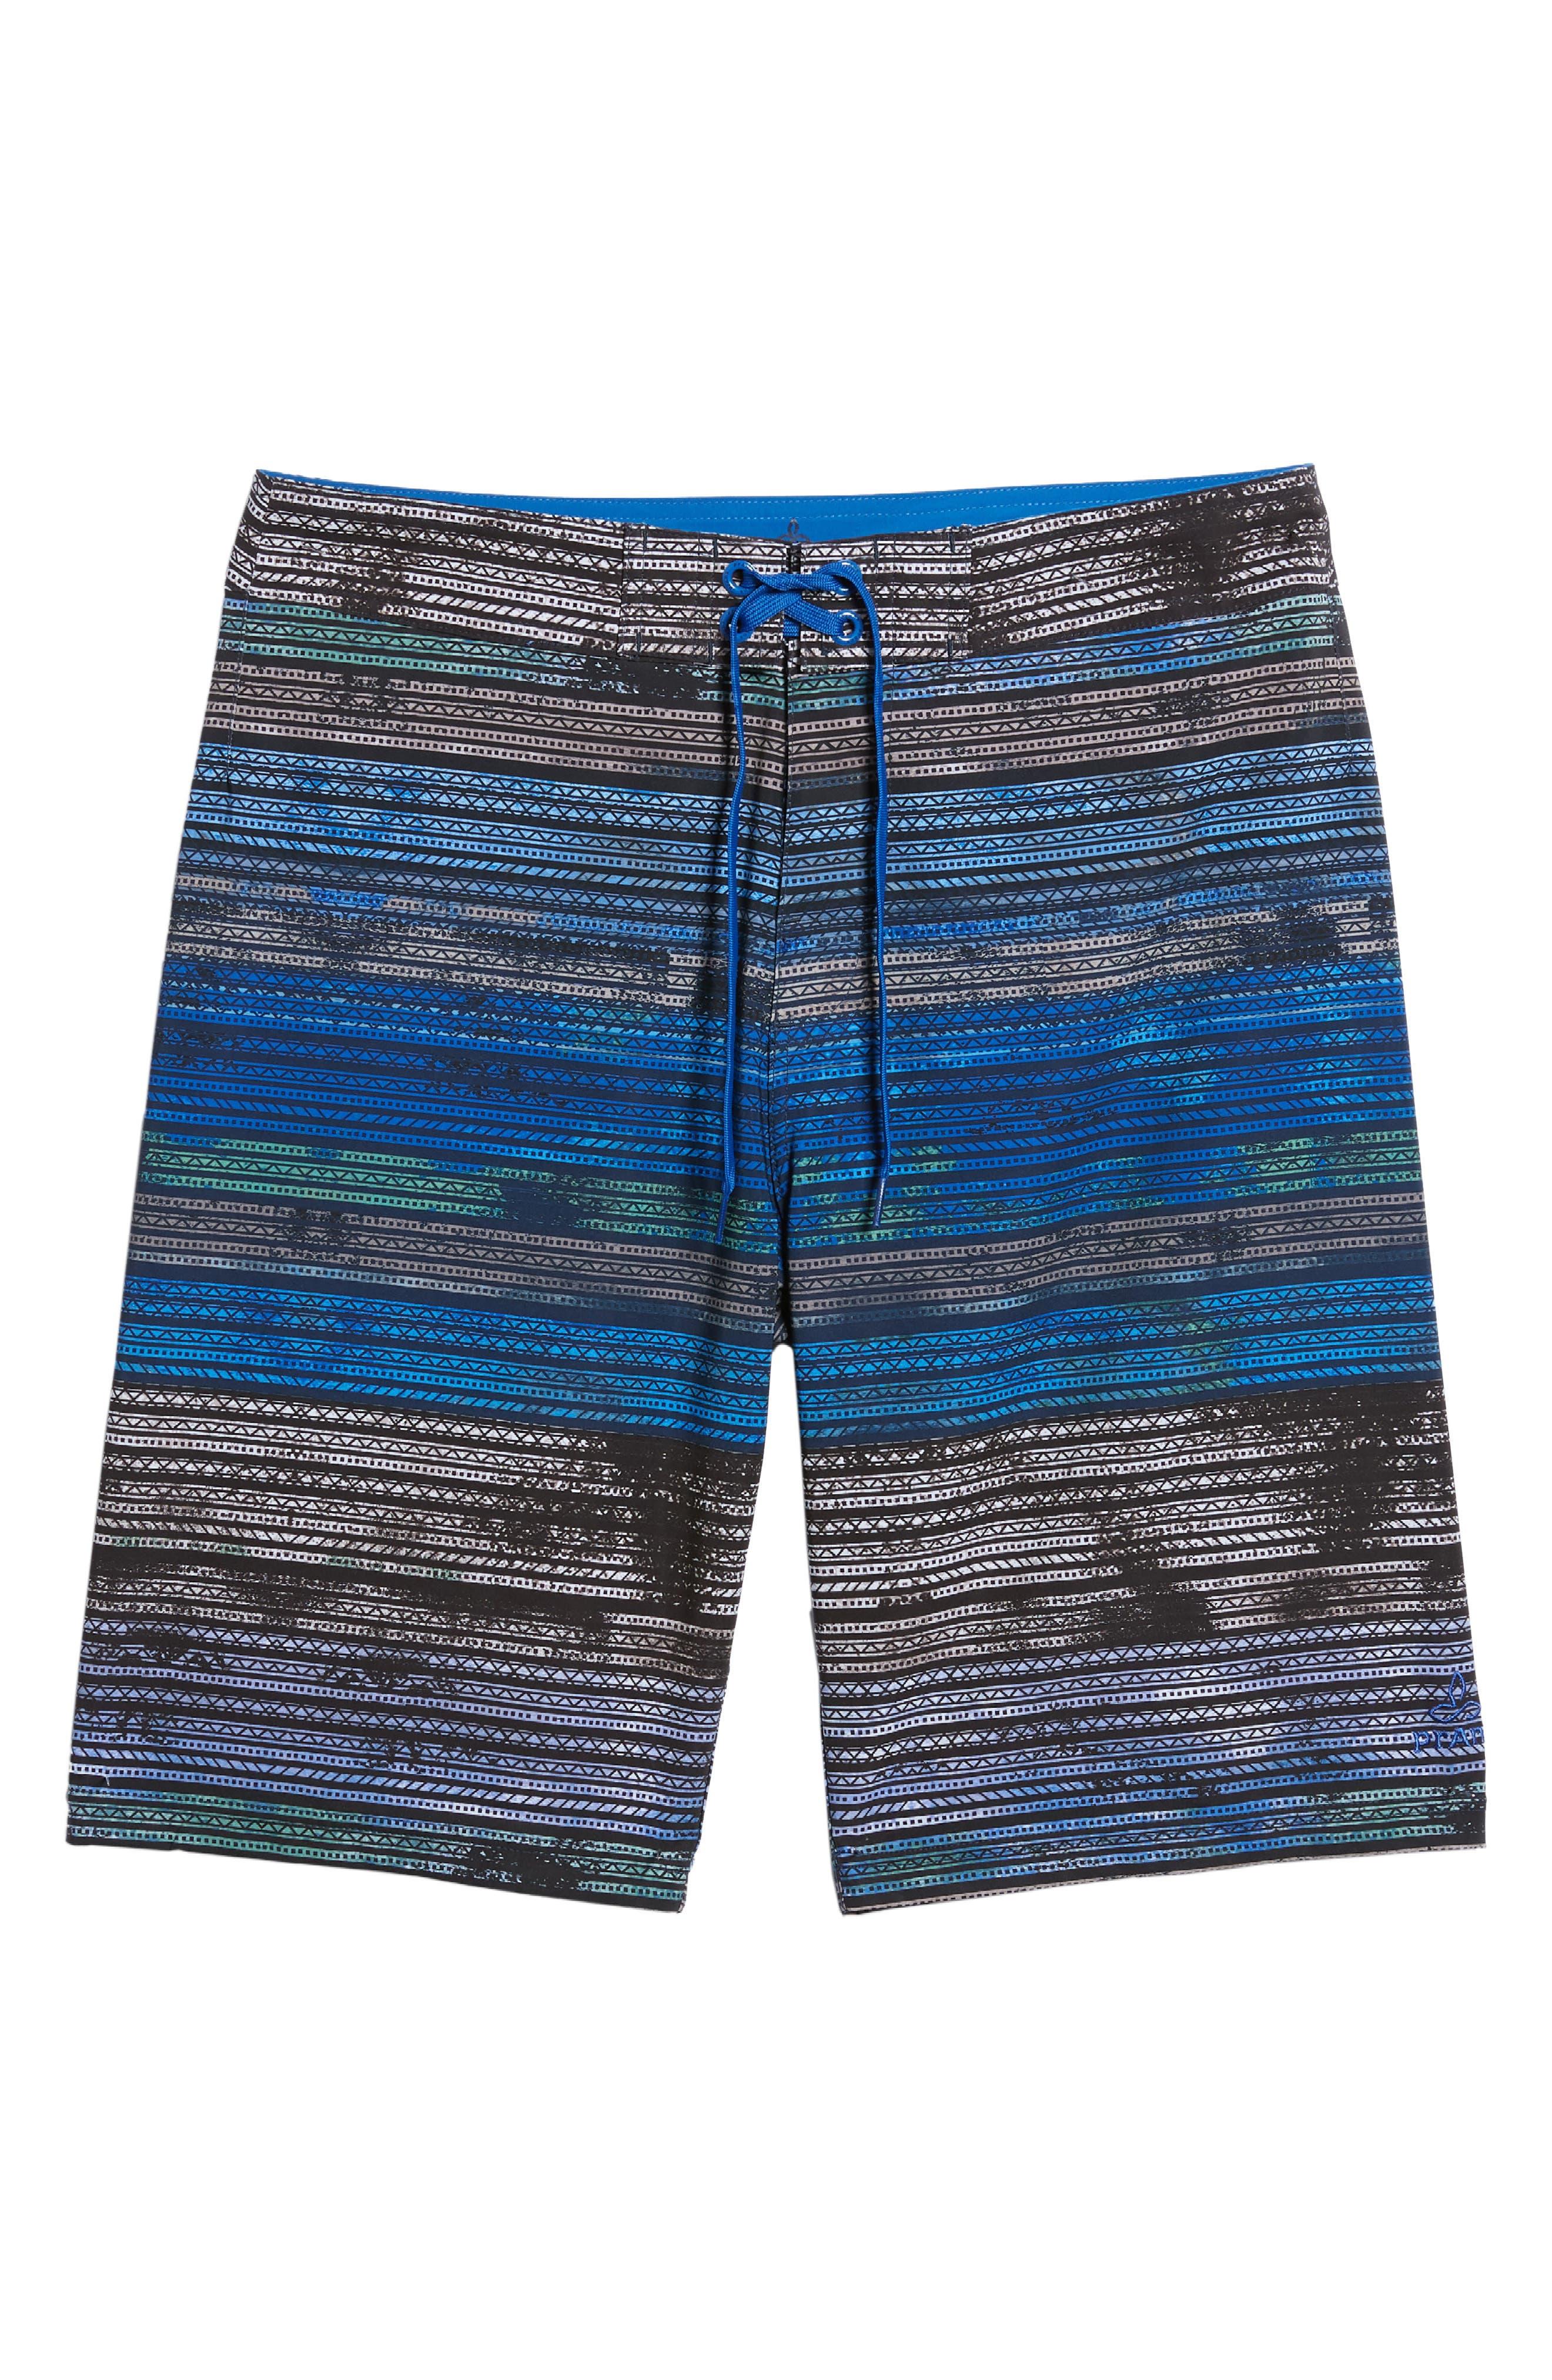 'Sediment' Stretch Board Shorts,                             Alternate thumbnail 77, color,